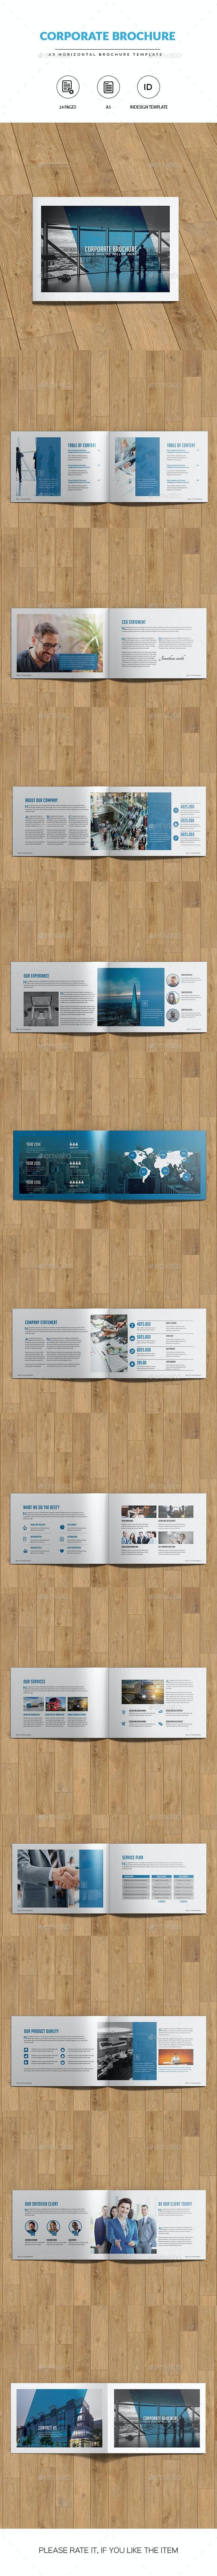 A5 Horizontal Business Brochure - Corporate Brochures